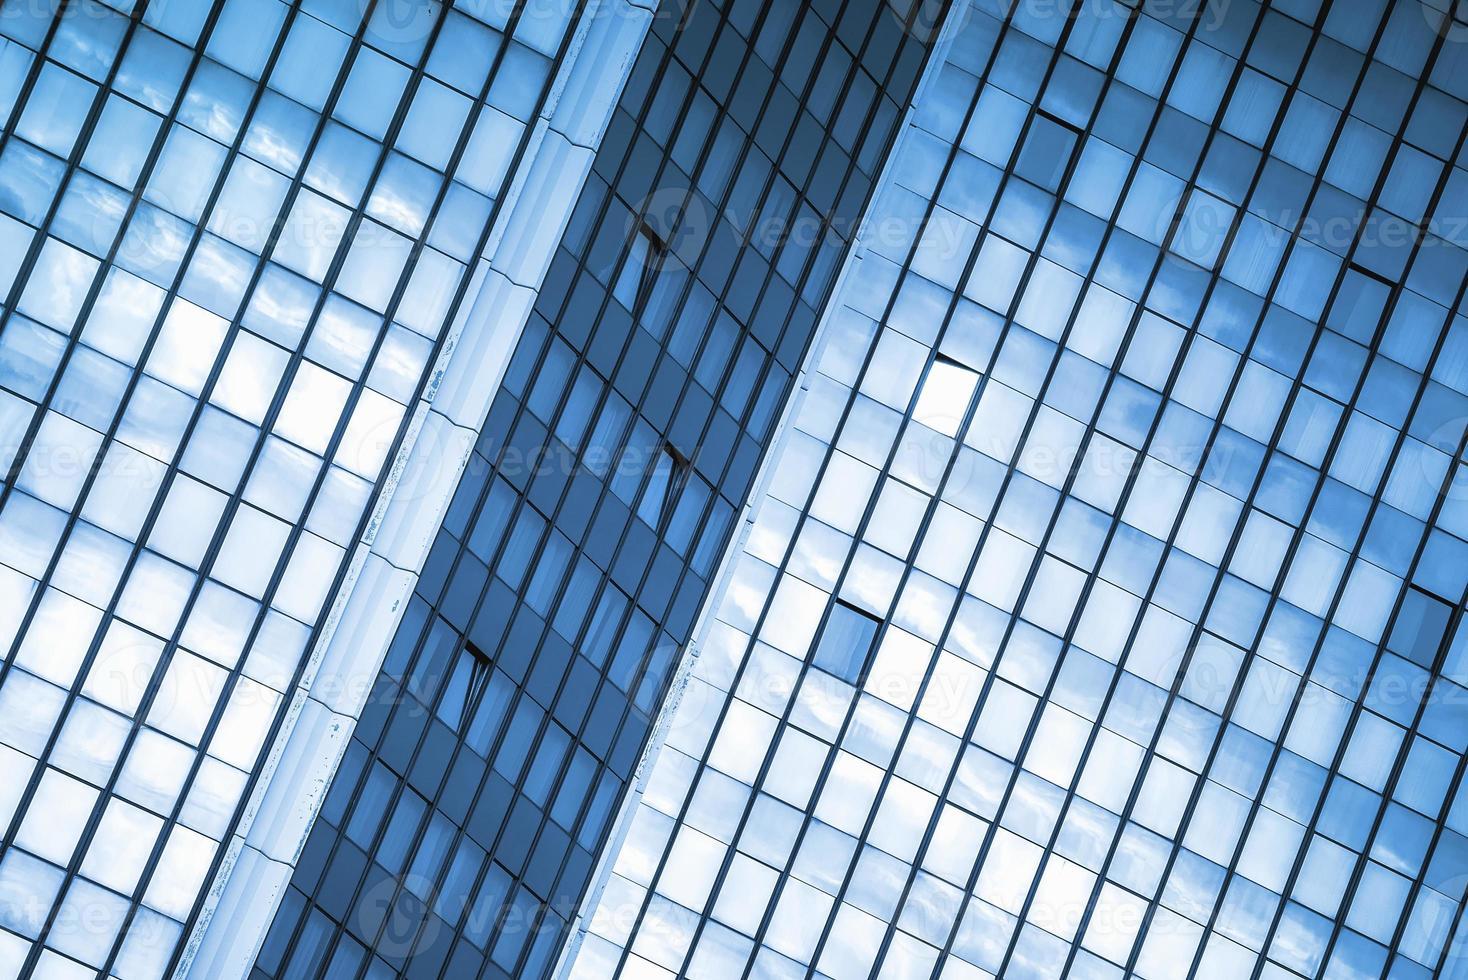 moden zakelijke kantoorgebouw windows herhalend patroon foto